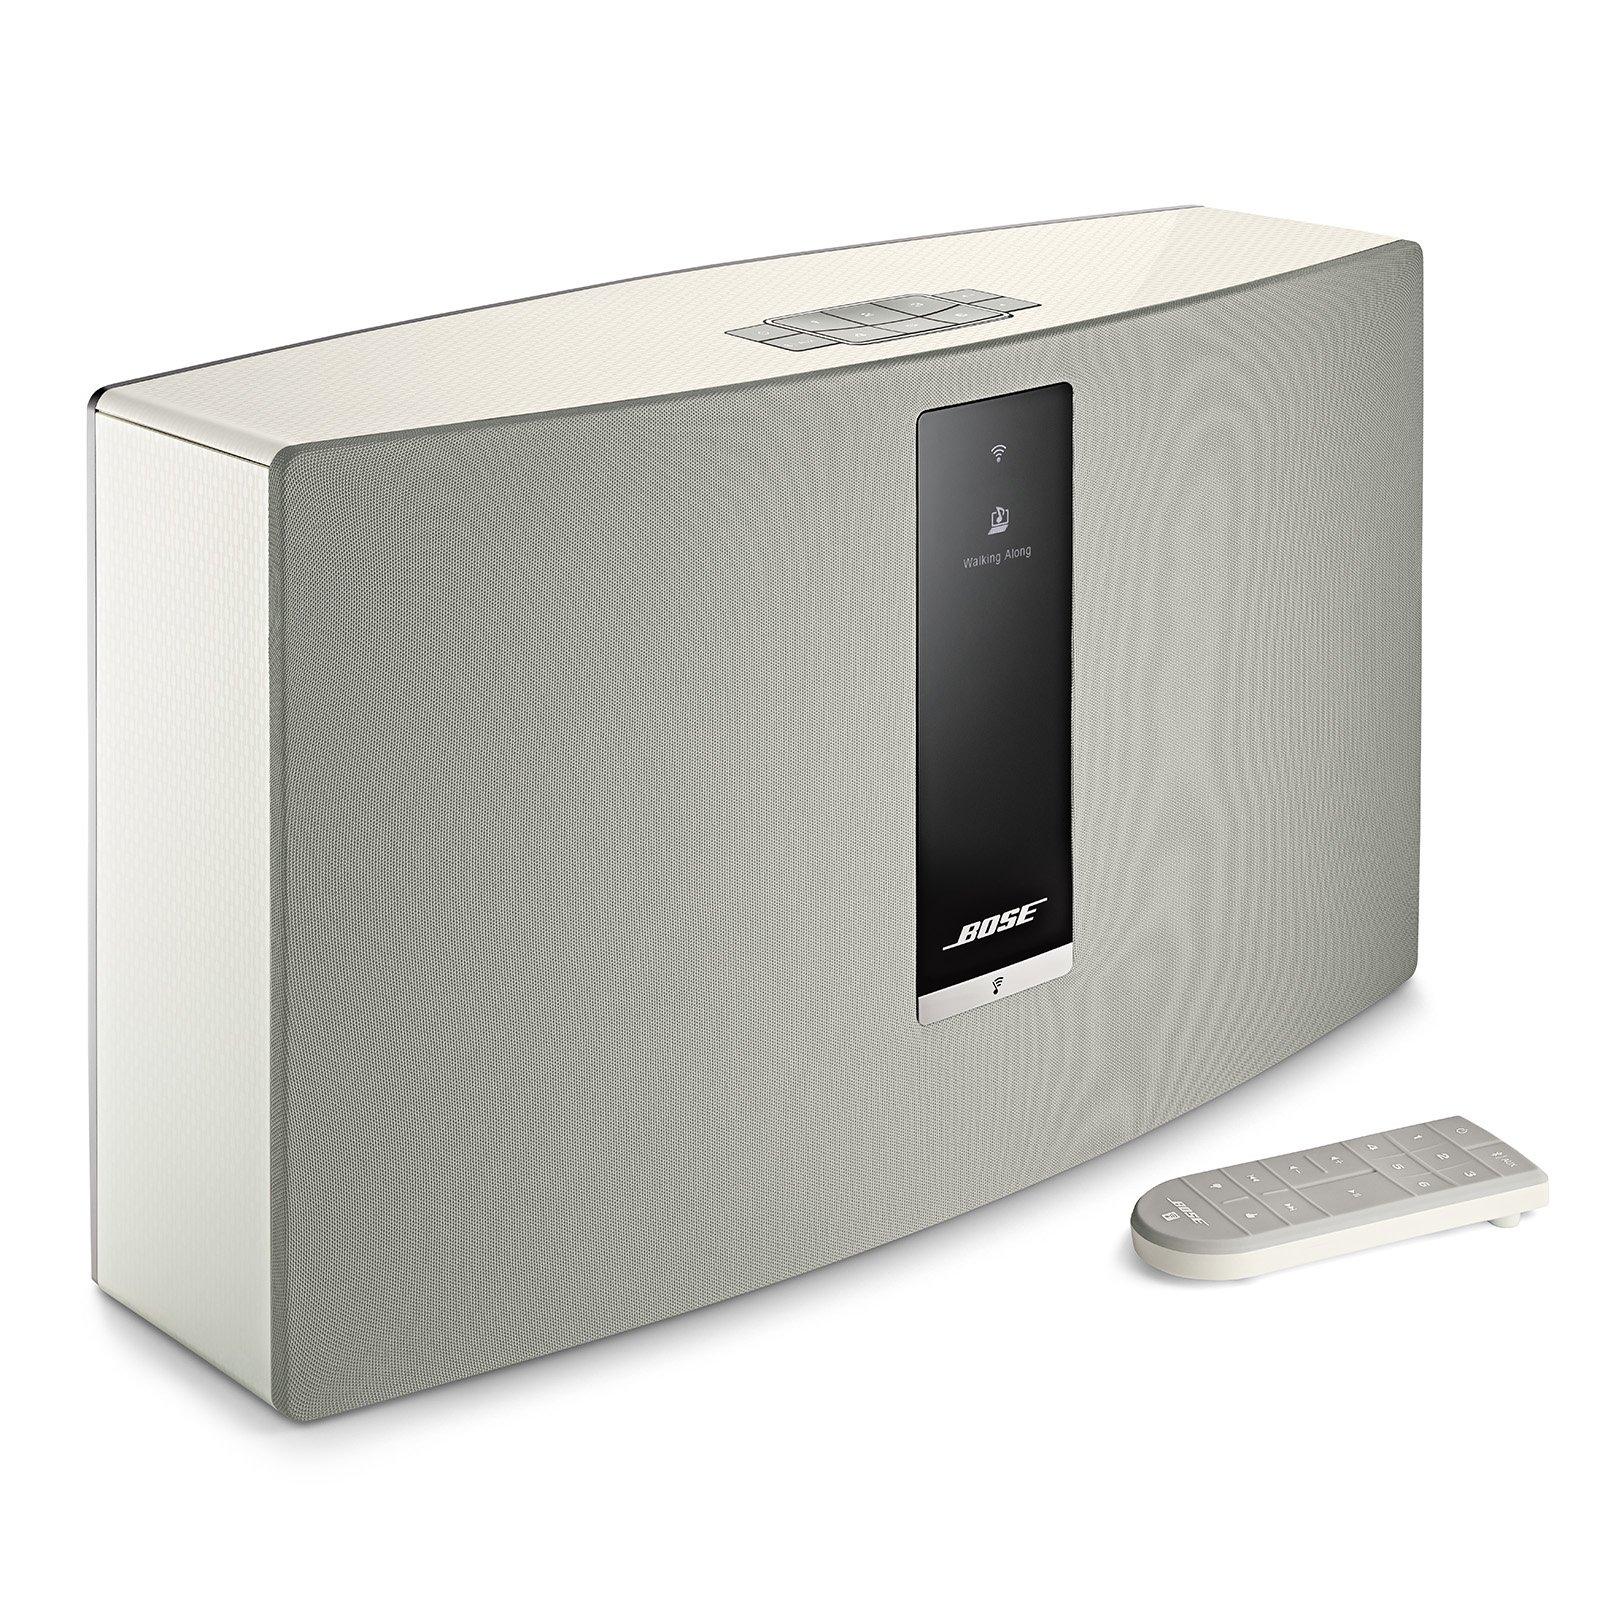 Bose SoundTouch 30 wireless speaker, works with Alexa - White